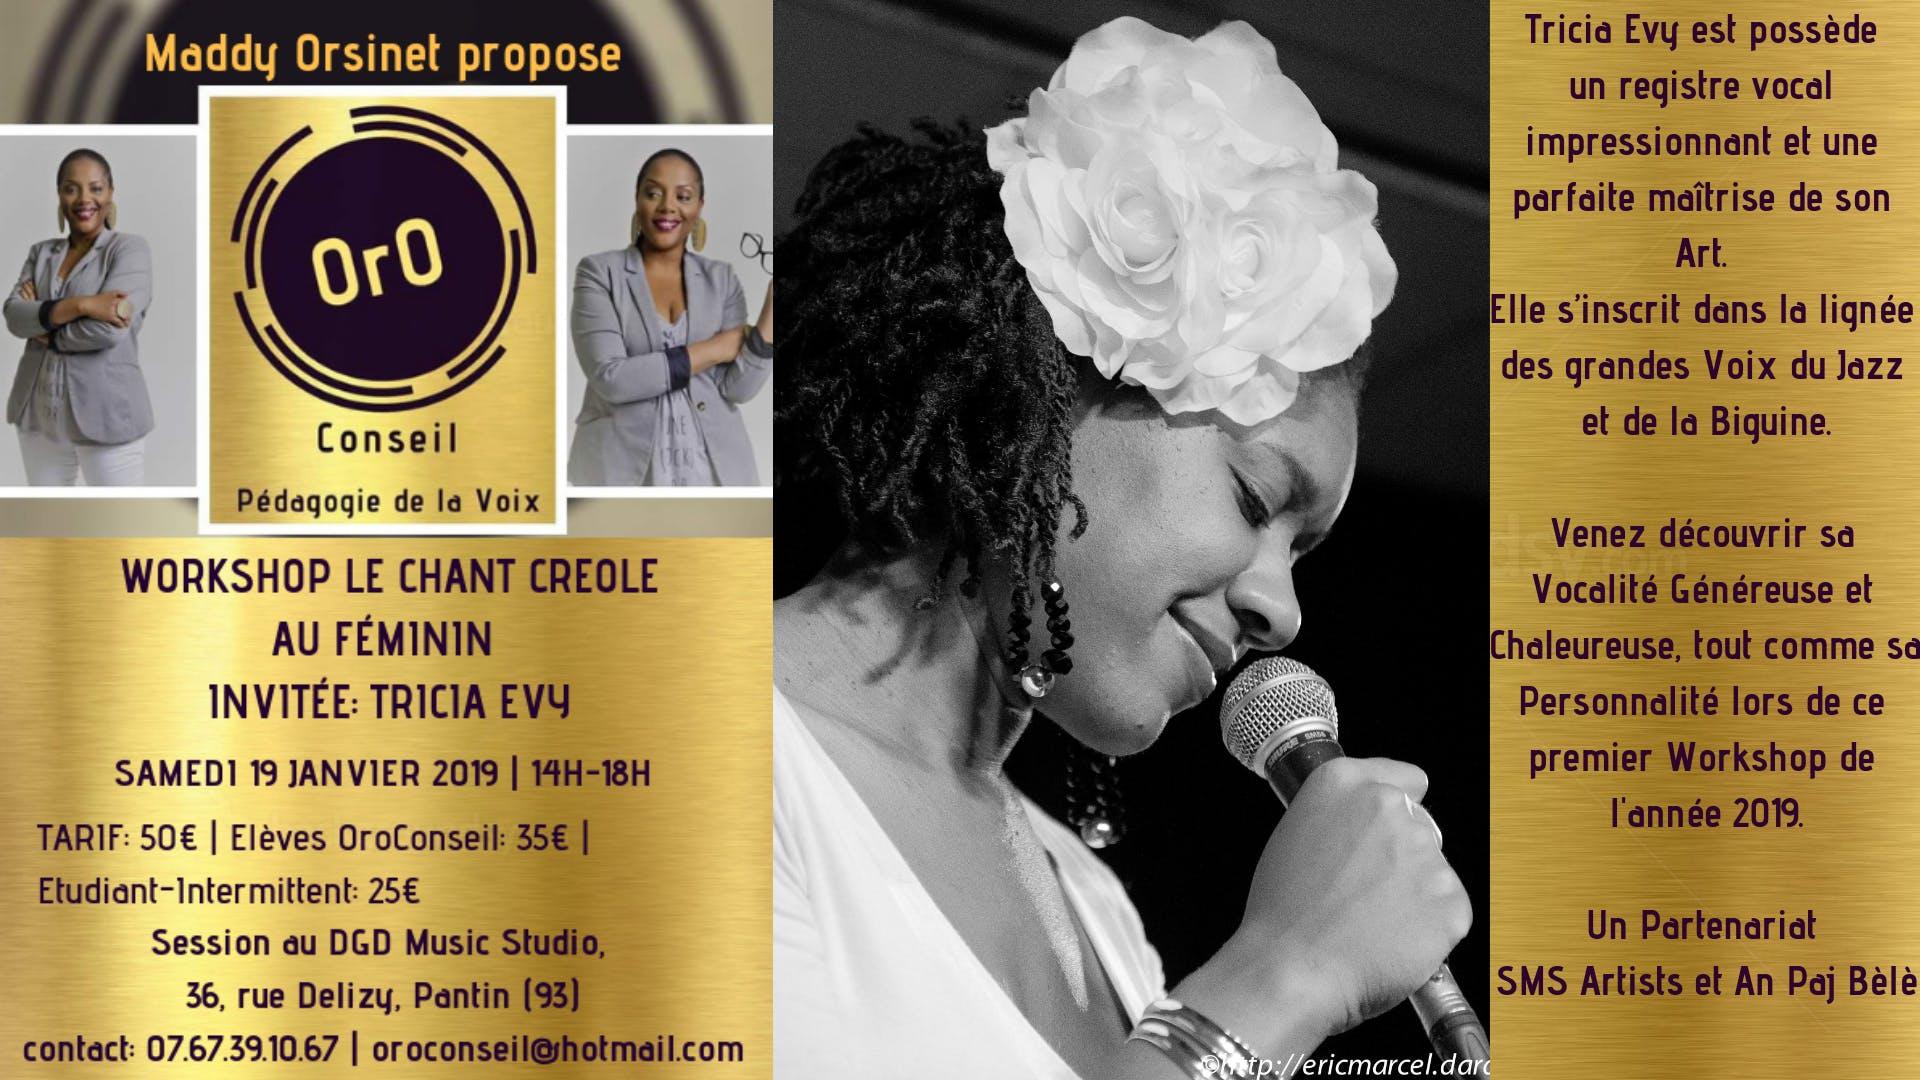 WORKSHOP LE CHANT CREOLE | Biguine & Jazz - OrO Conseil invite Tricia Evy